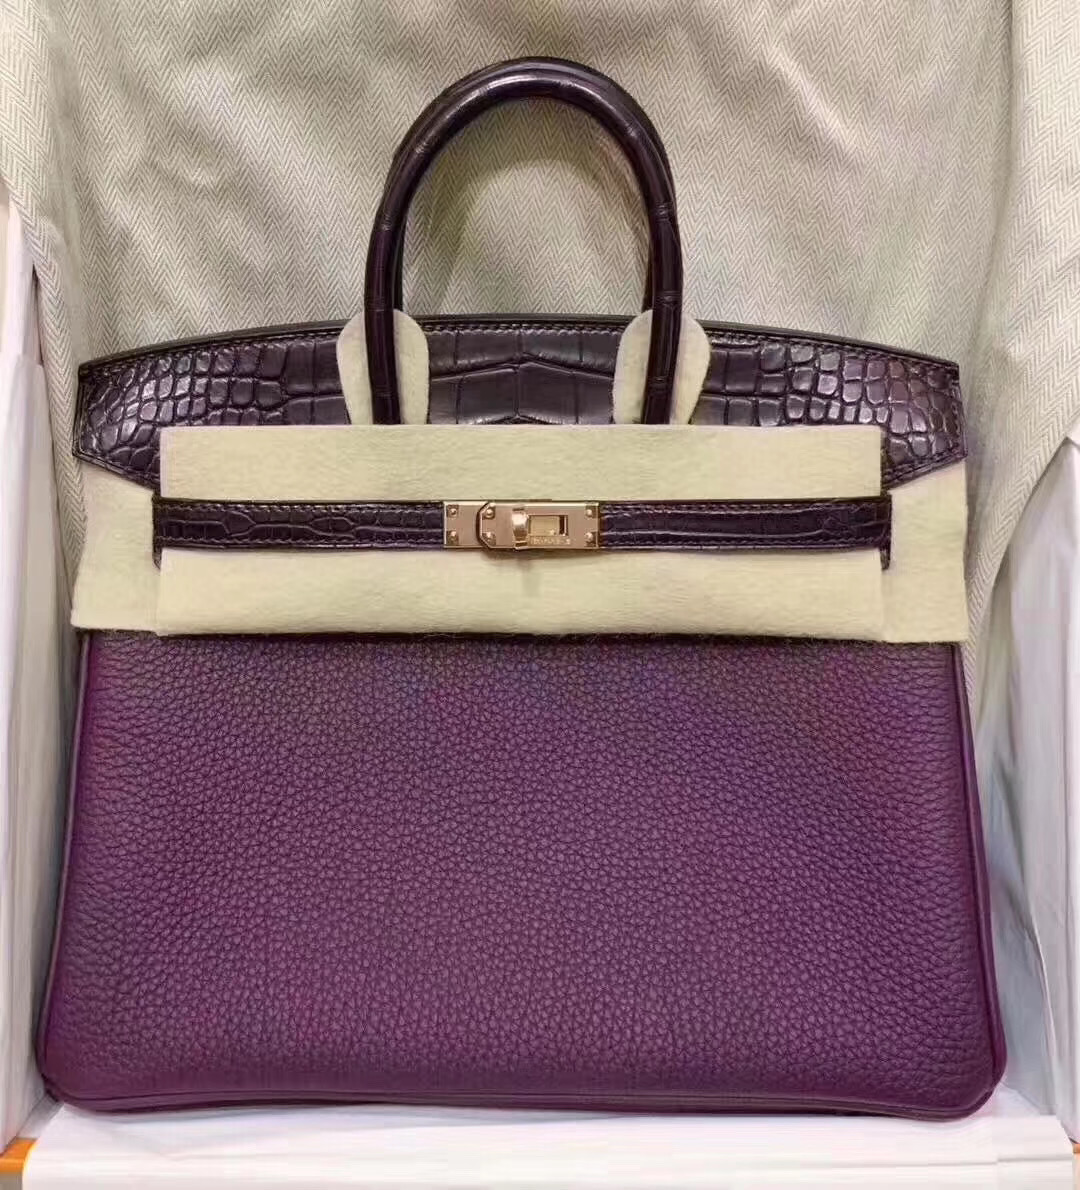 Hermès Birkin Touch 25cm CK59 葡萄紫 Raisin拼3W Prunoir 美洲鱷